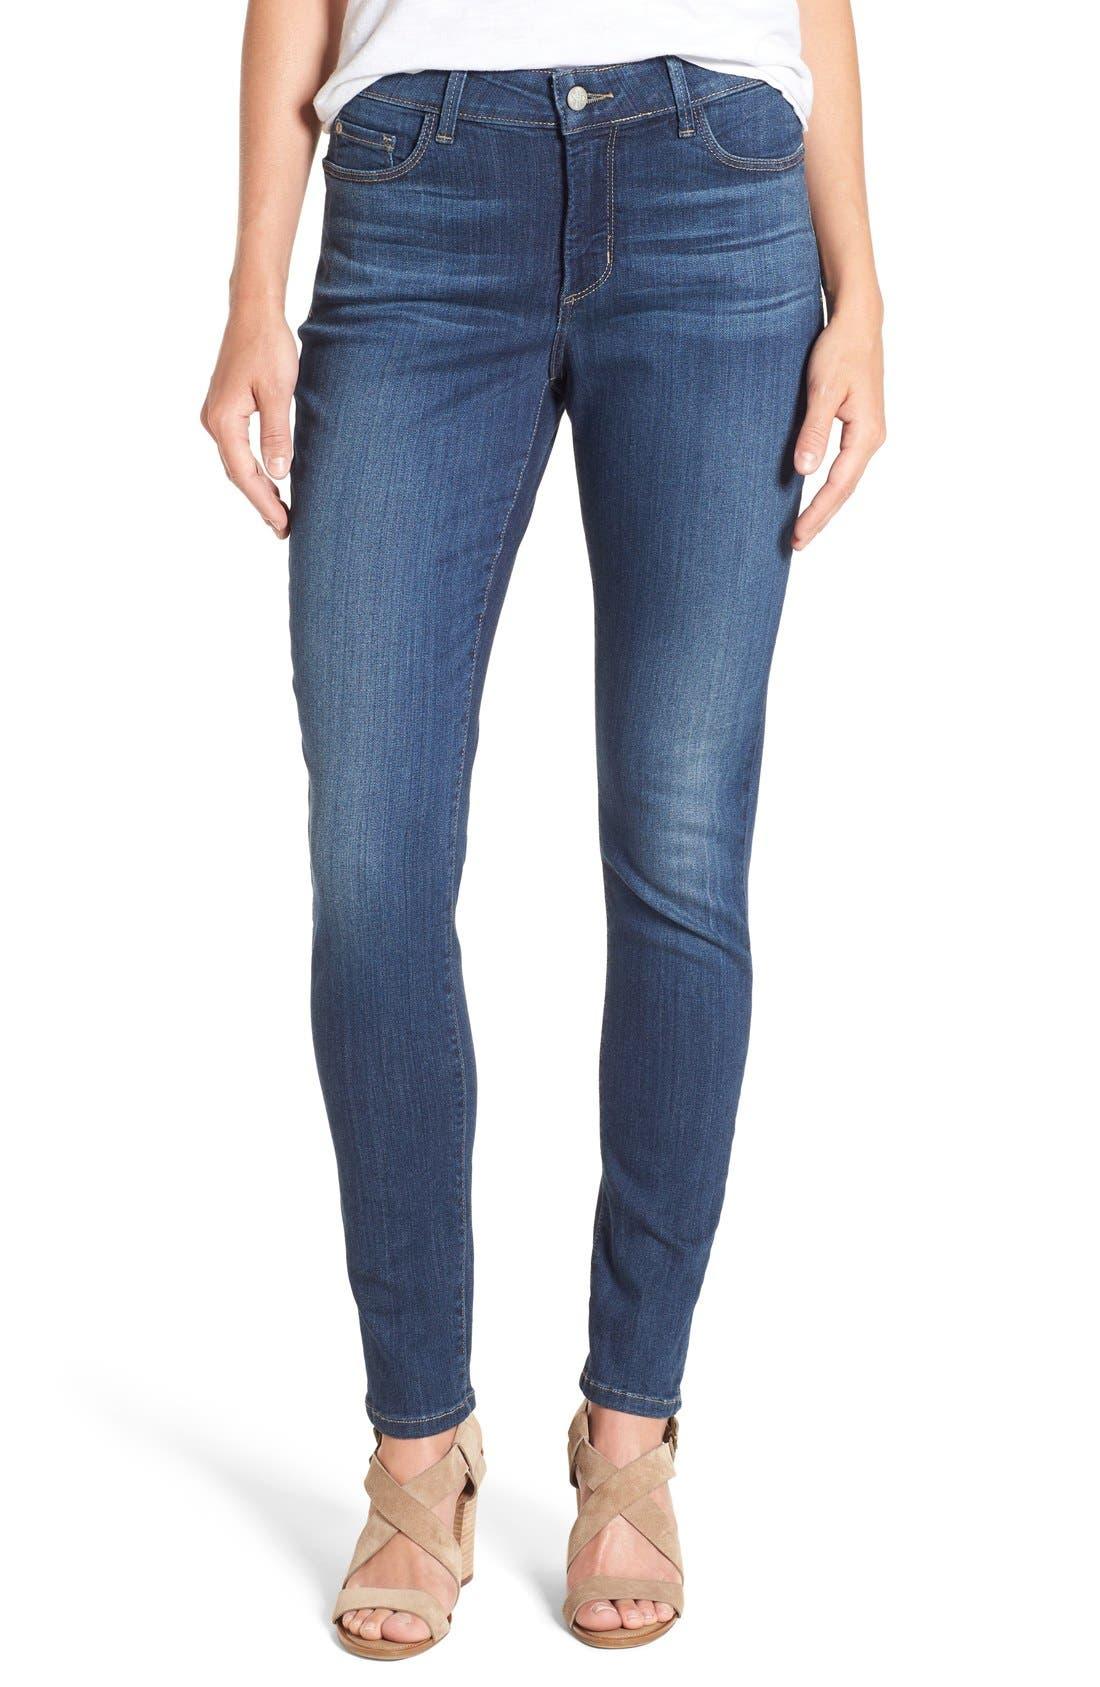 Main Image - NYDJ 'Ami' Stretch Skinny Jeans (Regular & Petite)